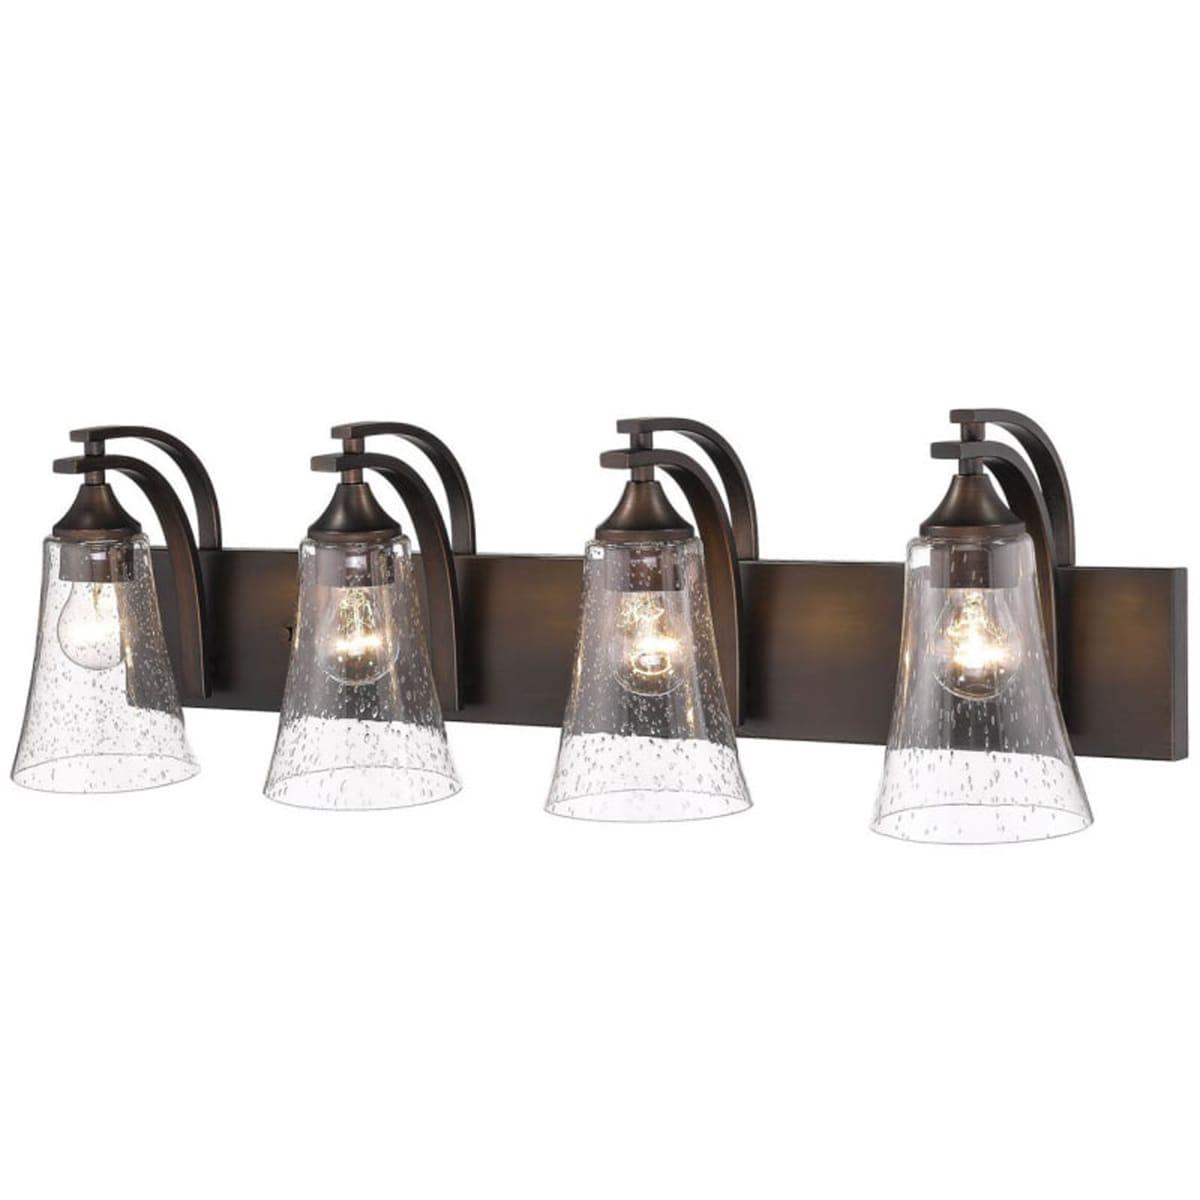 Home & Garden Lamps, Lighting & Ceiling Fans Wall Fixtures ...